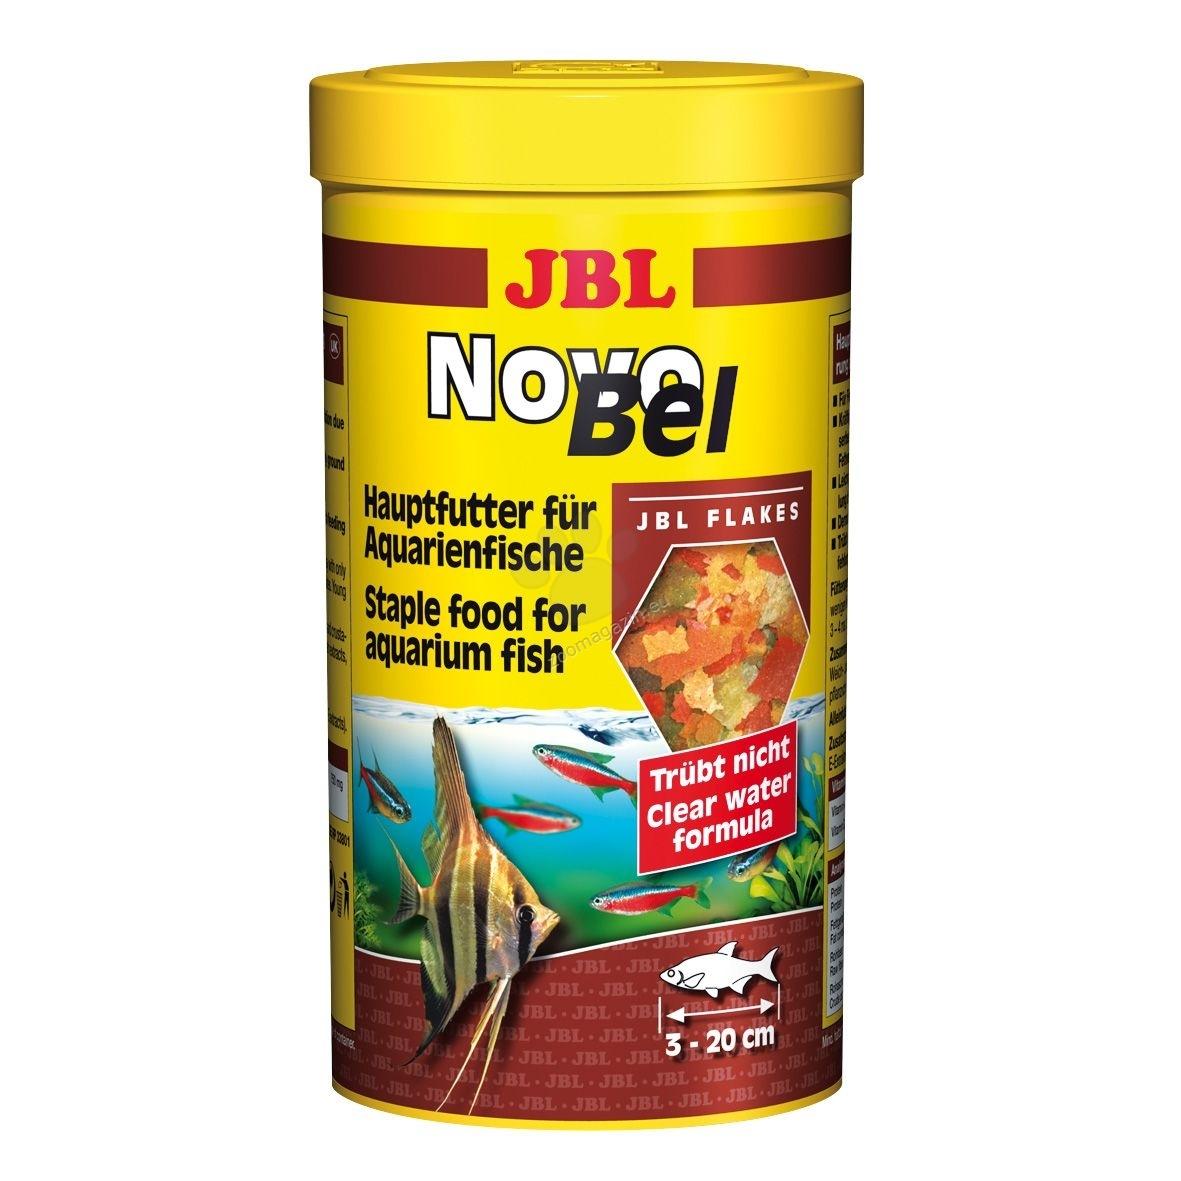 JBL NovoBel - βασική τροφή για όλα τα διακοσμητικά ψάρια - 5500 ml